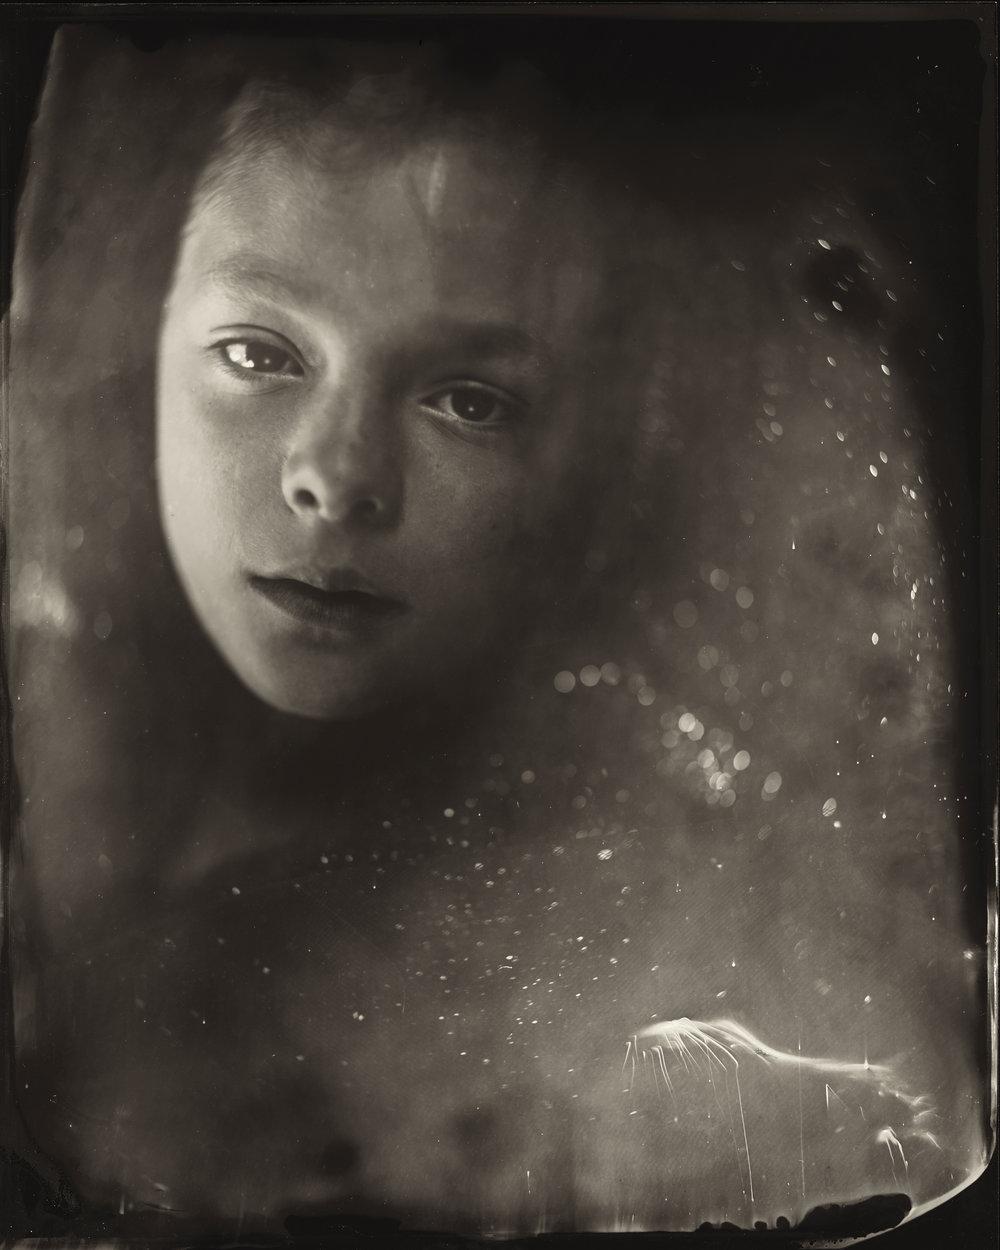 Nebula © Jacqueline Roberts